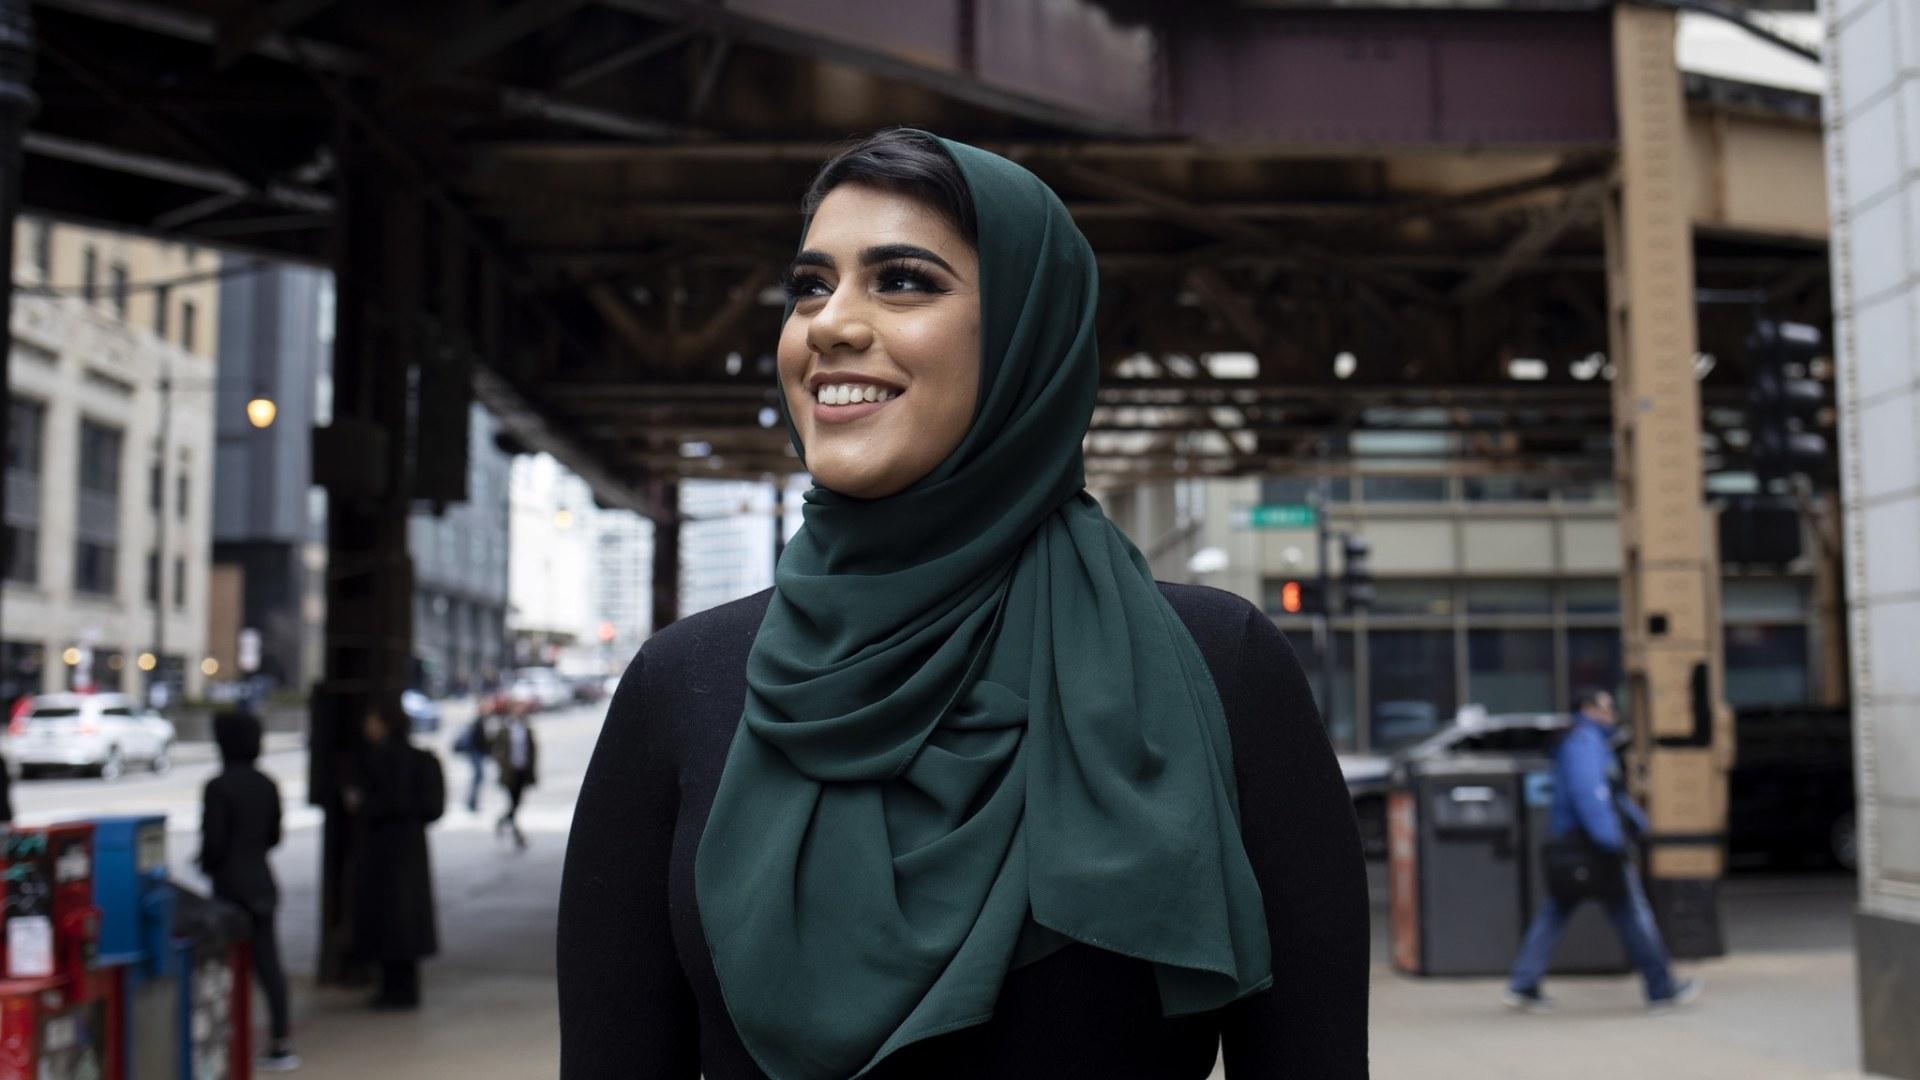 Bentuk Inspirasi Bridesmaid Hijab Irdz islamic Clothing In Chicago Berbagi Ilmu Belajar Bersama